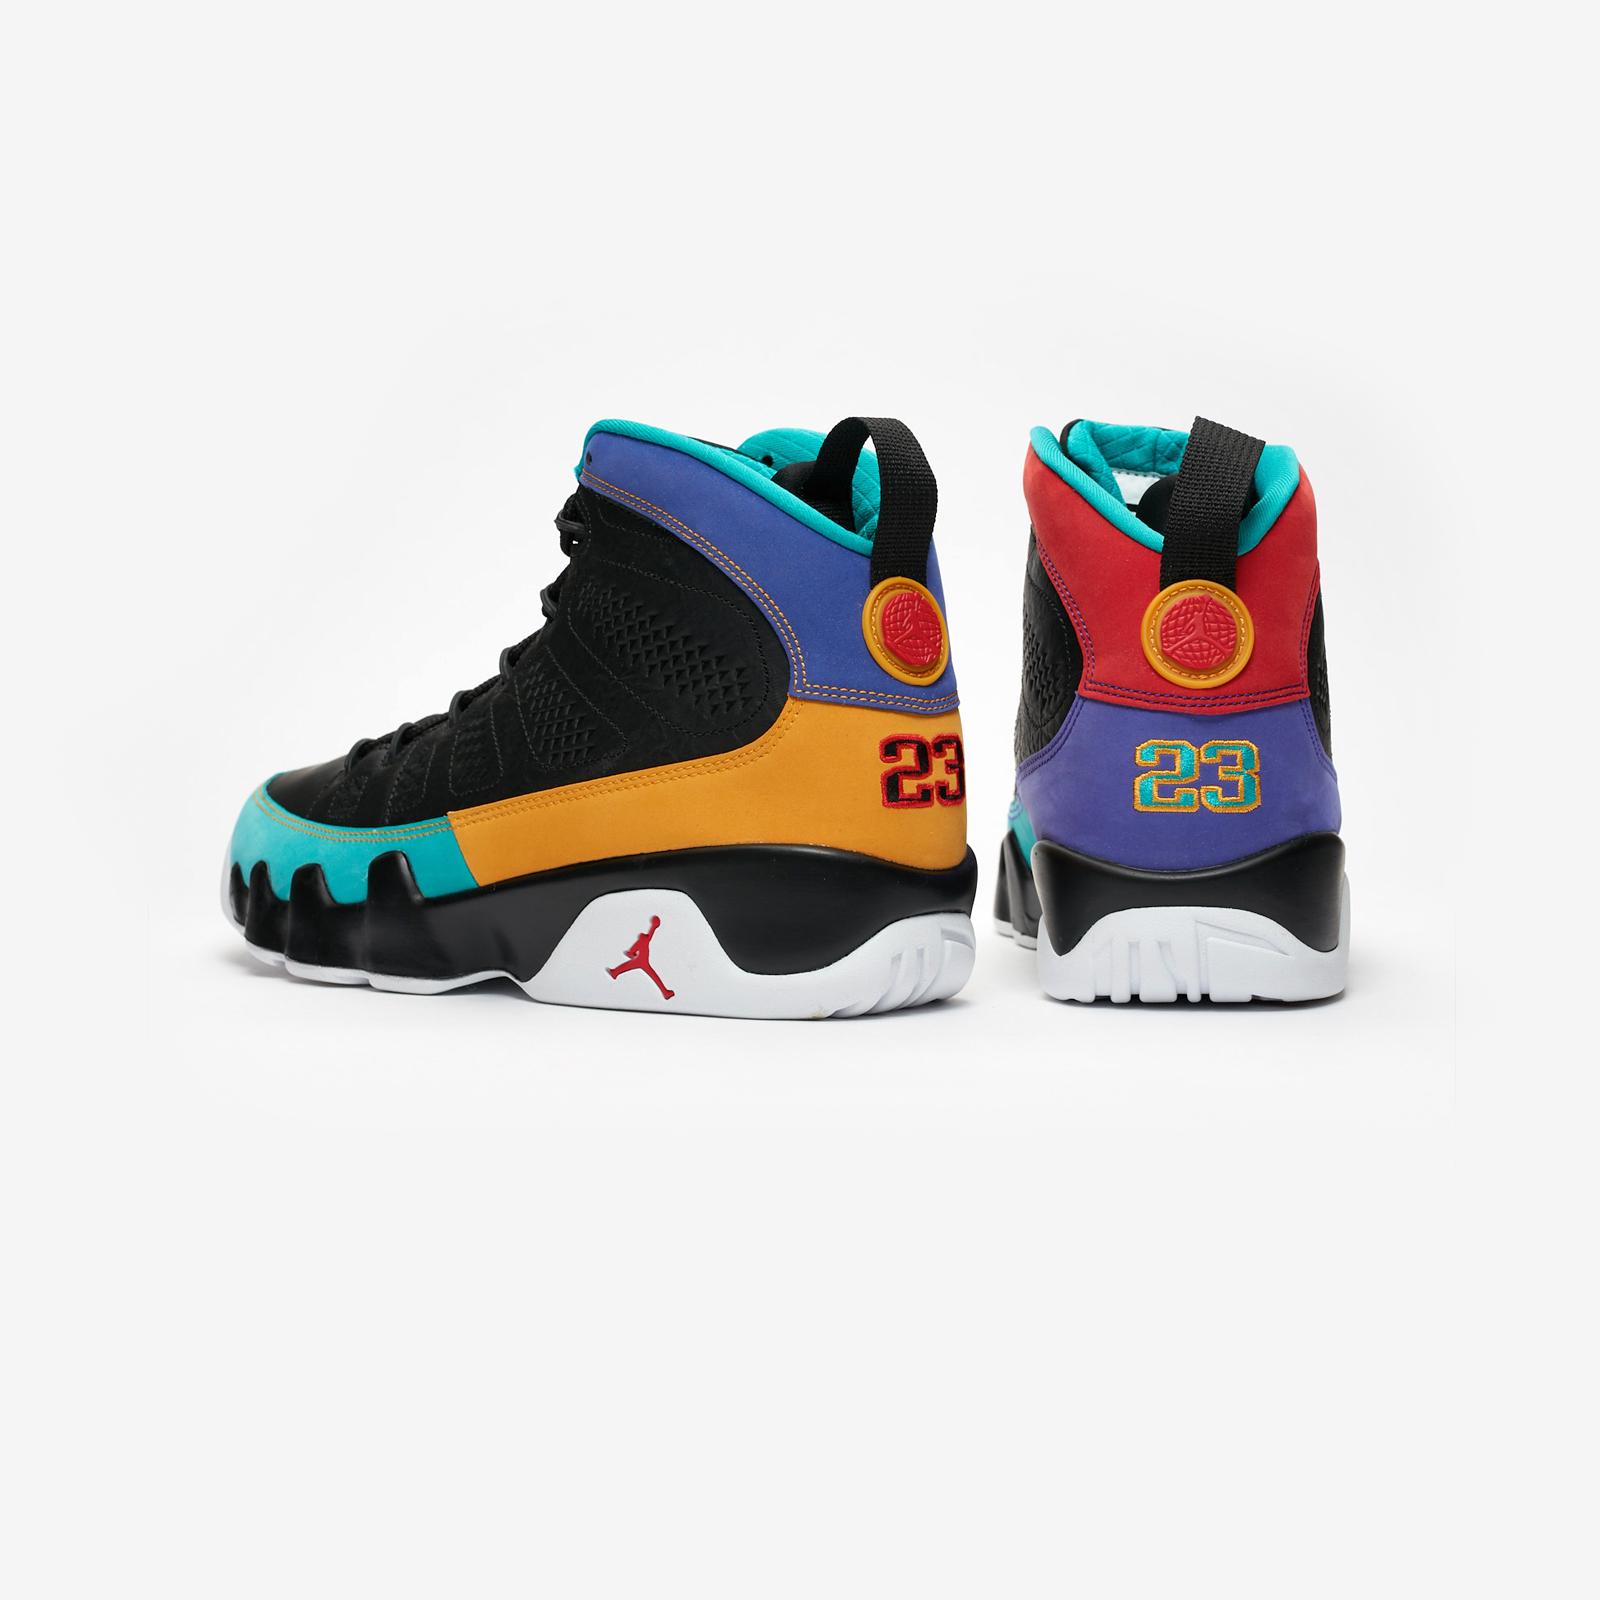 4d2dbee63 Jordan Brand Air Jordan 9 Retro - 302370-065 - Sneakersnstuff ...